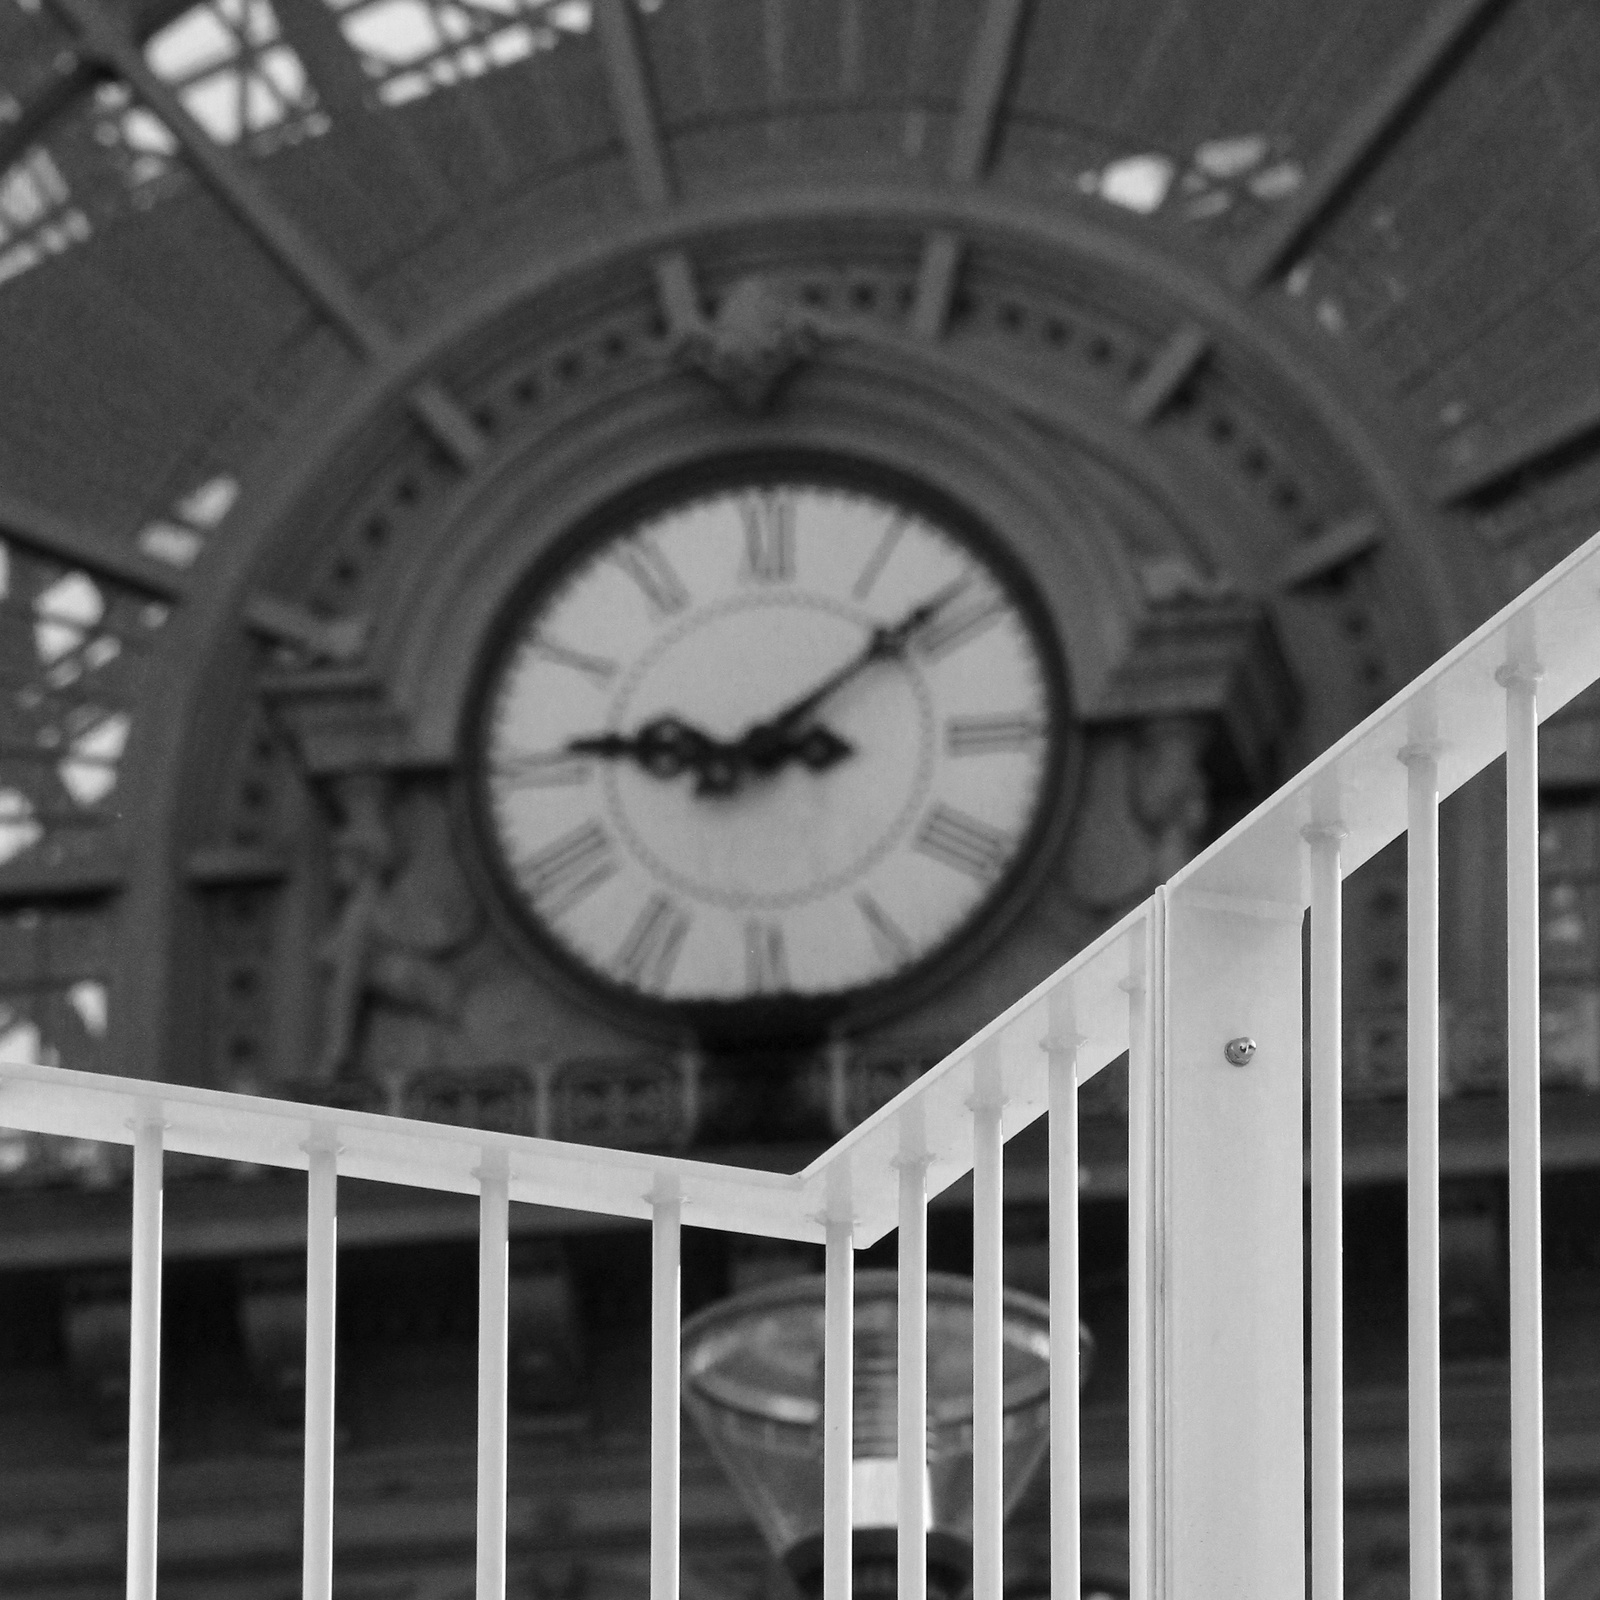 A korlát a pontos időt mutatja